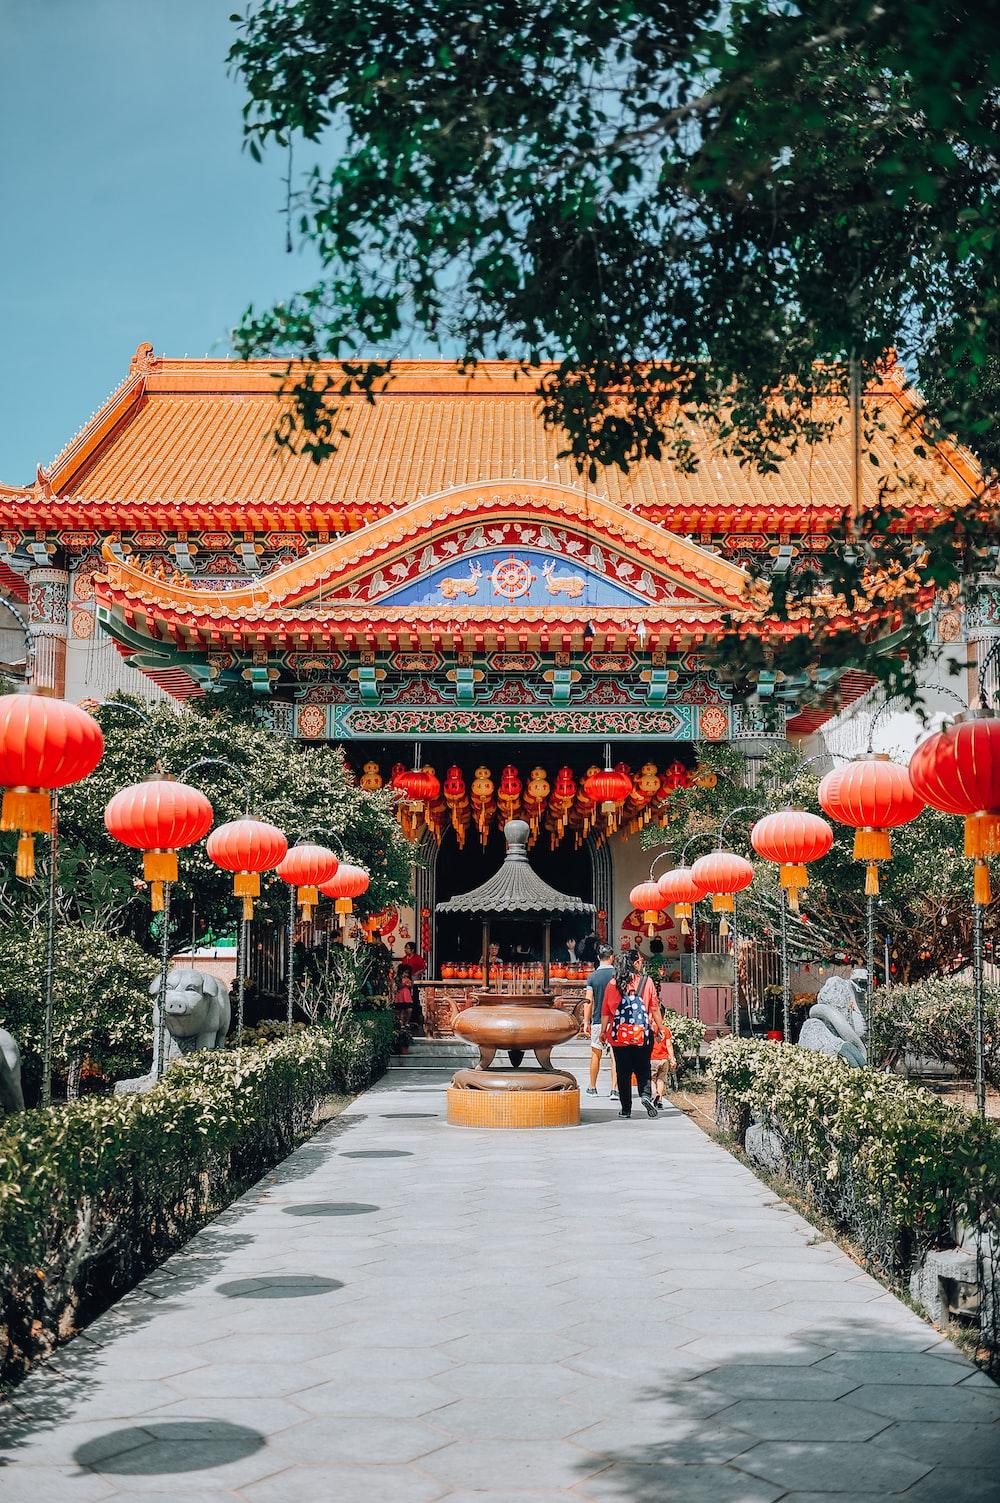 red chinese lanterns on green trees during daytime